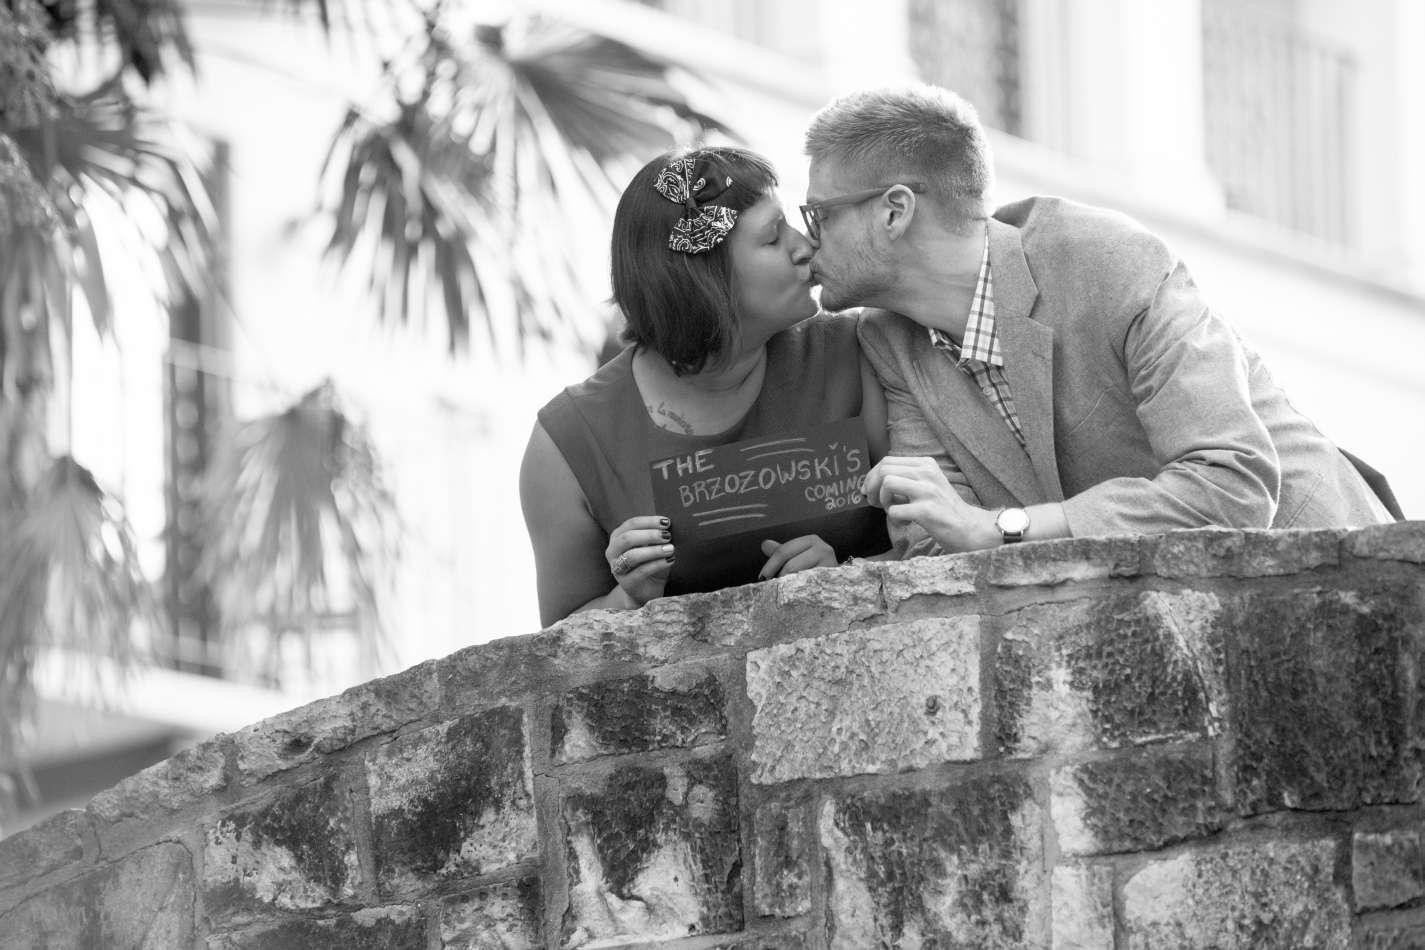 HighDot Studios - Sarah and Zach - Engagement Session - San Antonio - Riverwalk - San Antonio Zoo (7)